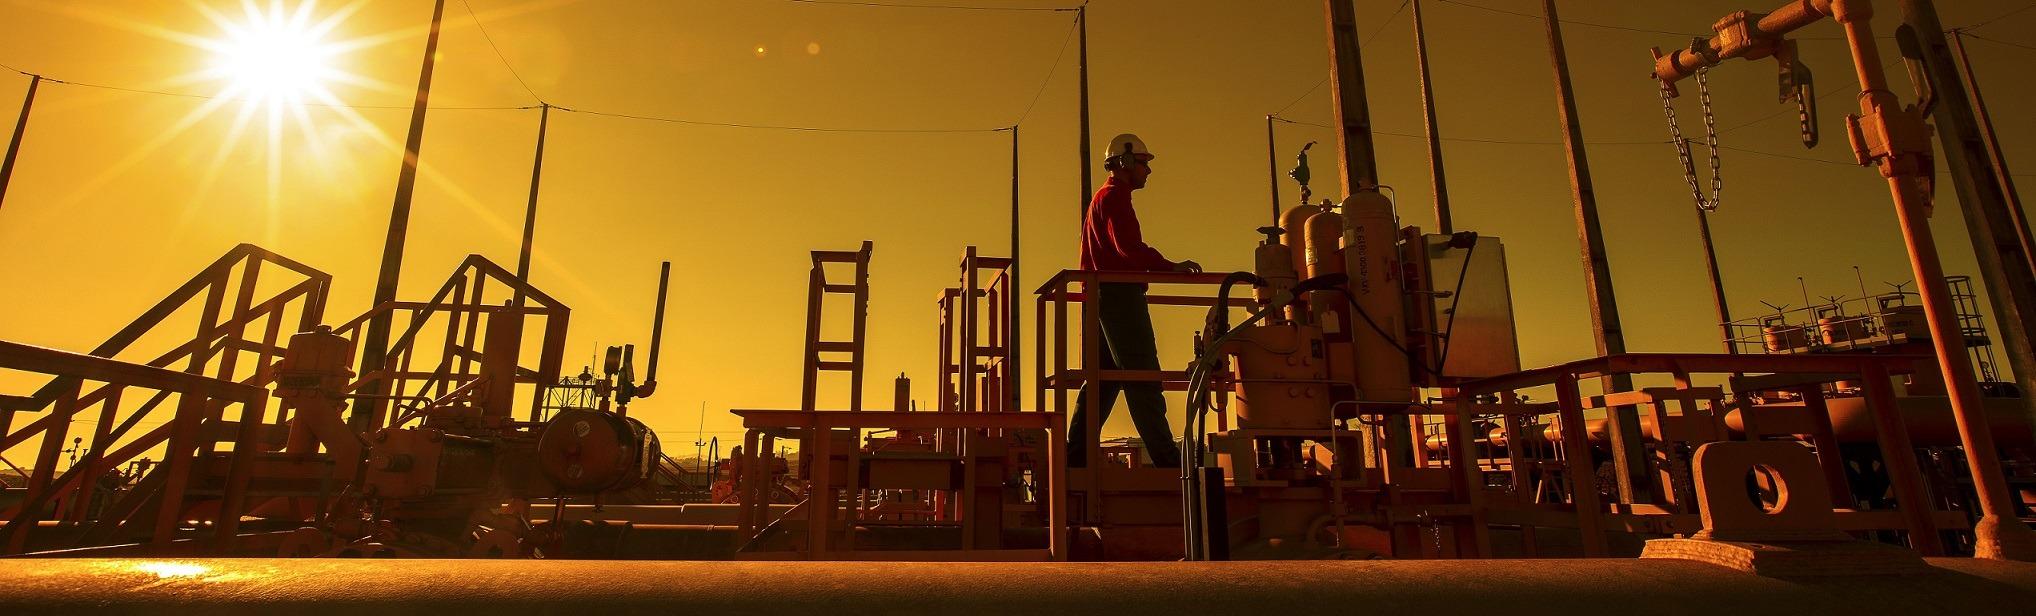 Técnico de Gasodutos - PCM (Campos Elíseos/RJ)